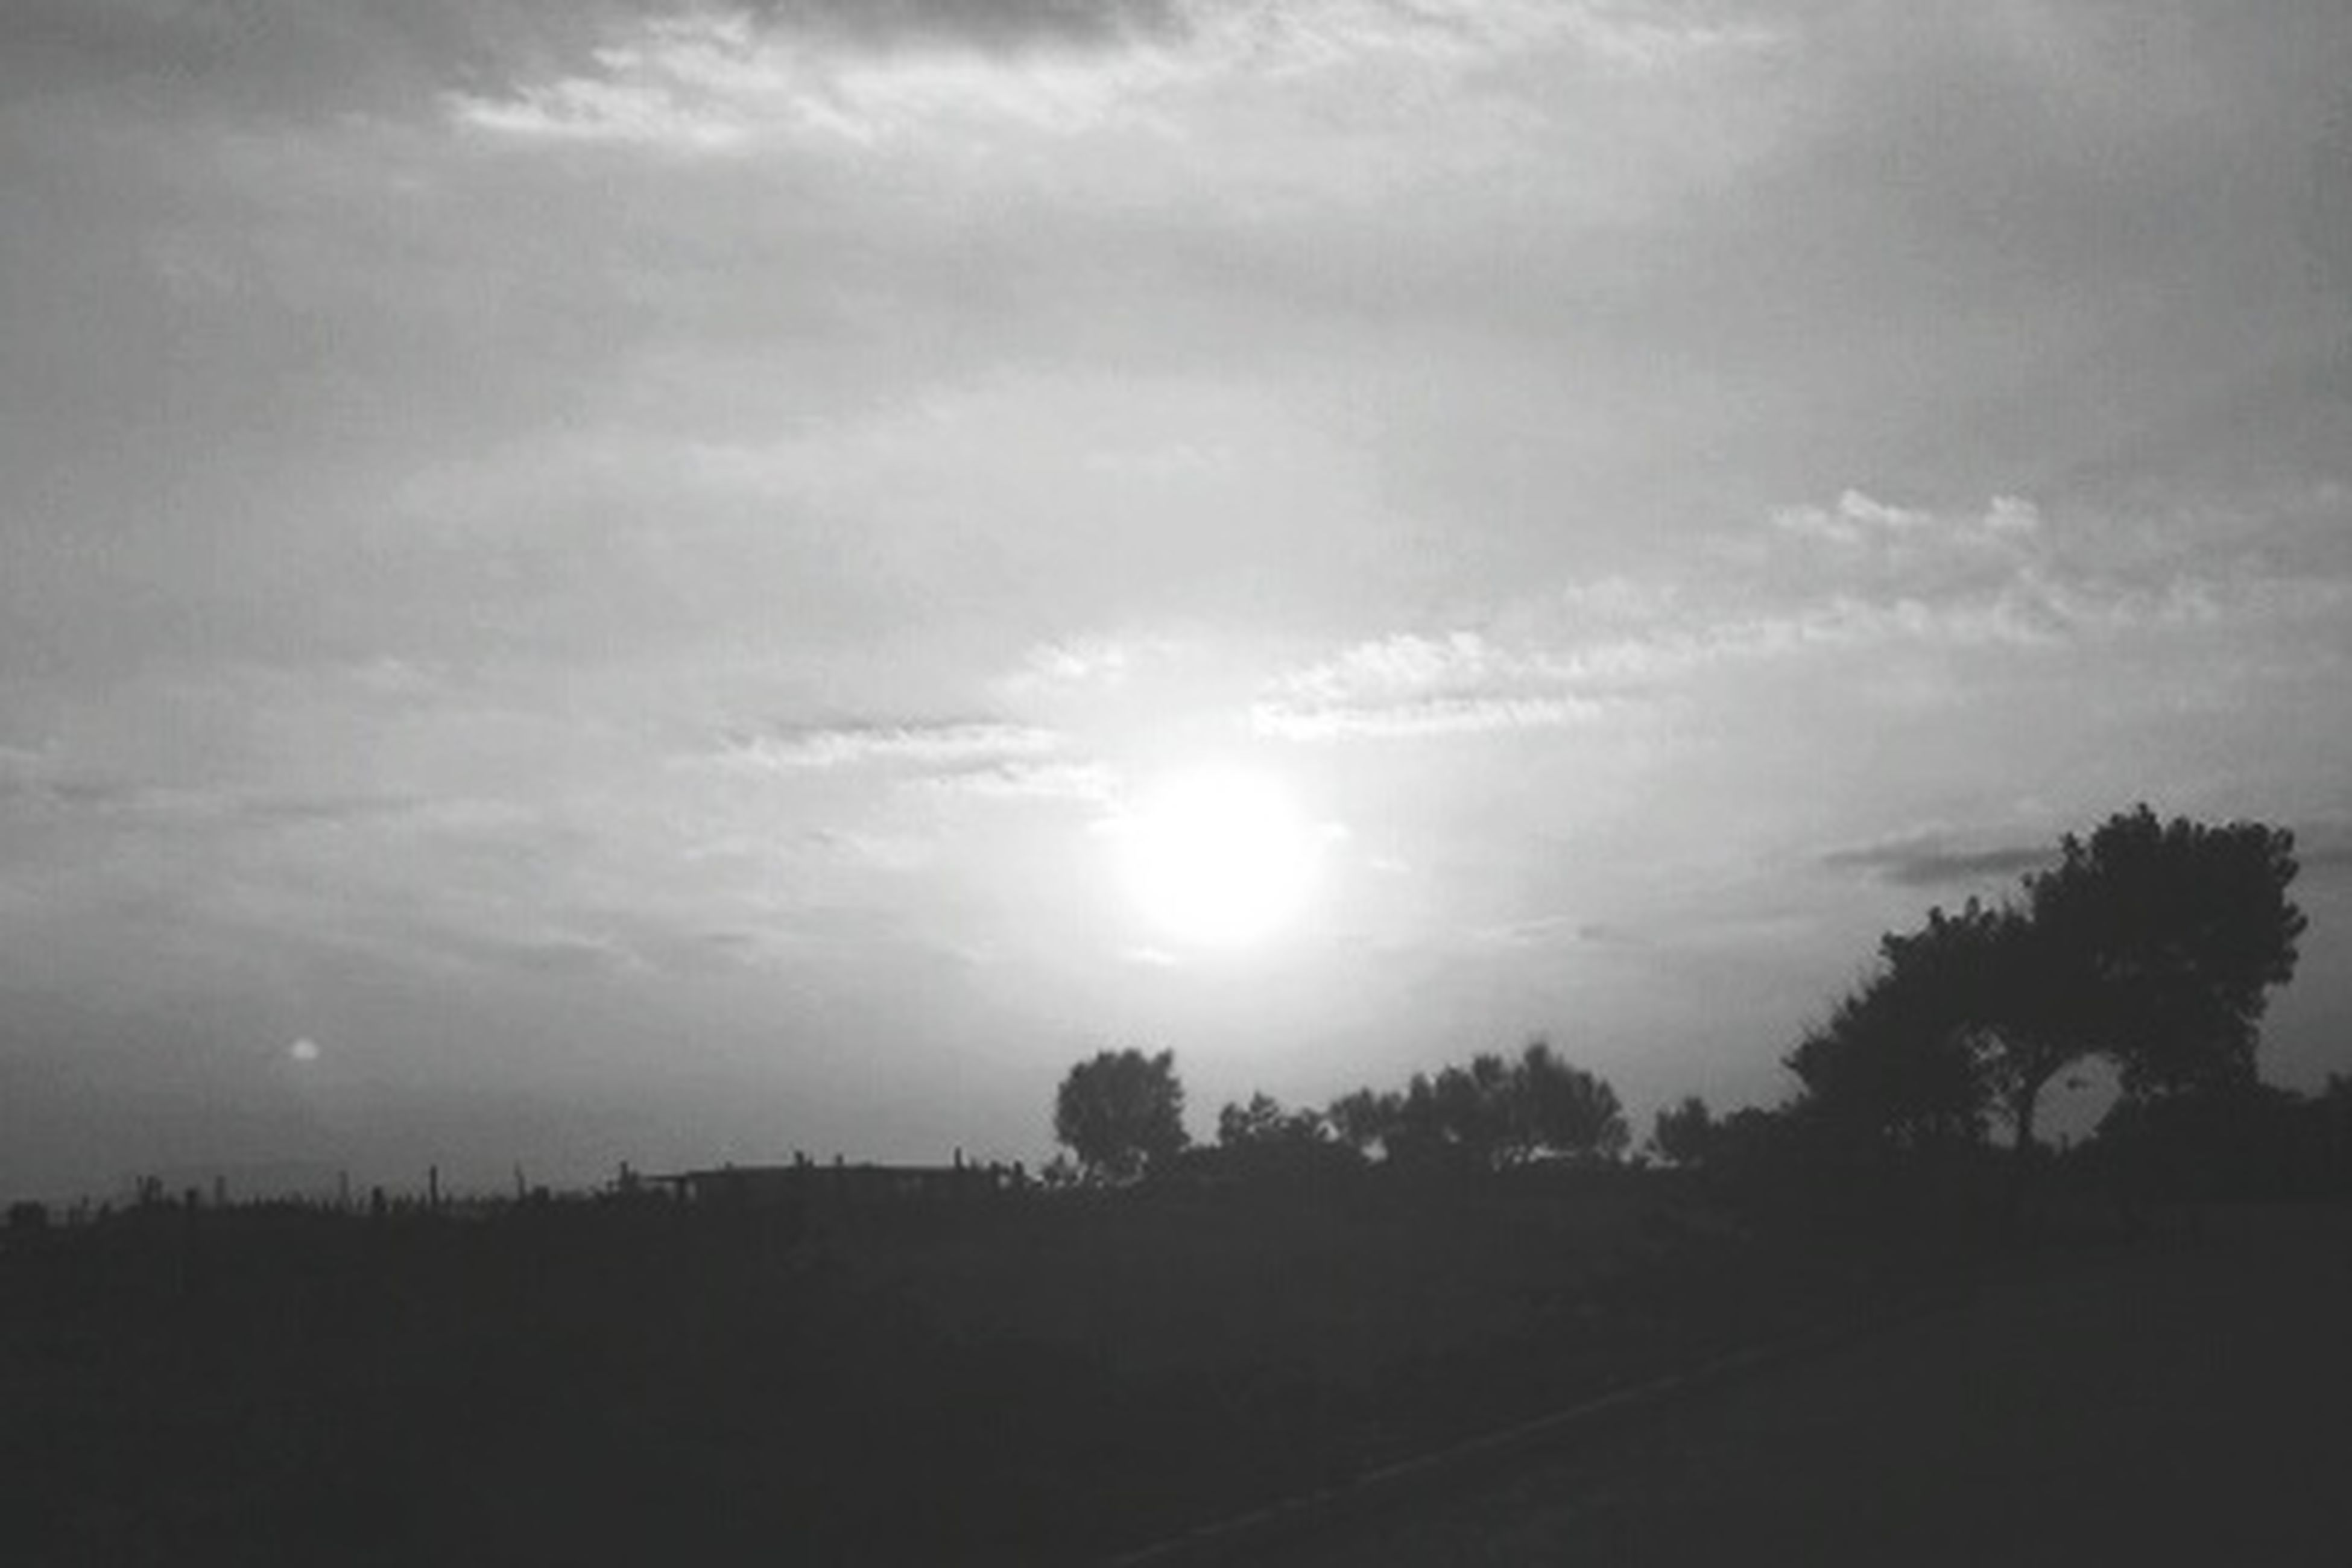 sky, tranquil scene, tranquility, sun, silhouette, scenics, beauty in nature, cloud - sky, landscape, tree, nature, sunbeam, sunlight, field, sunset, cloudy, cloud, idyllic, lens flare, outdoors